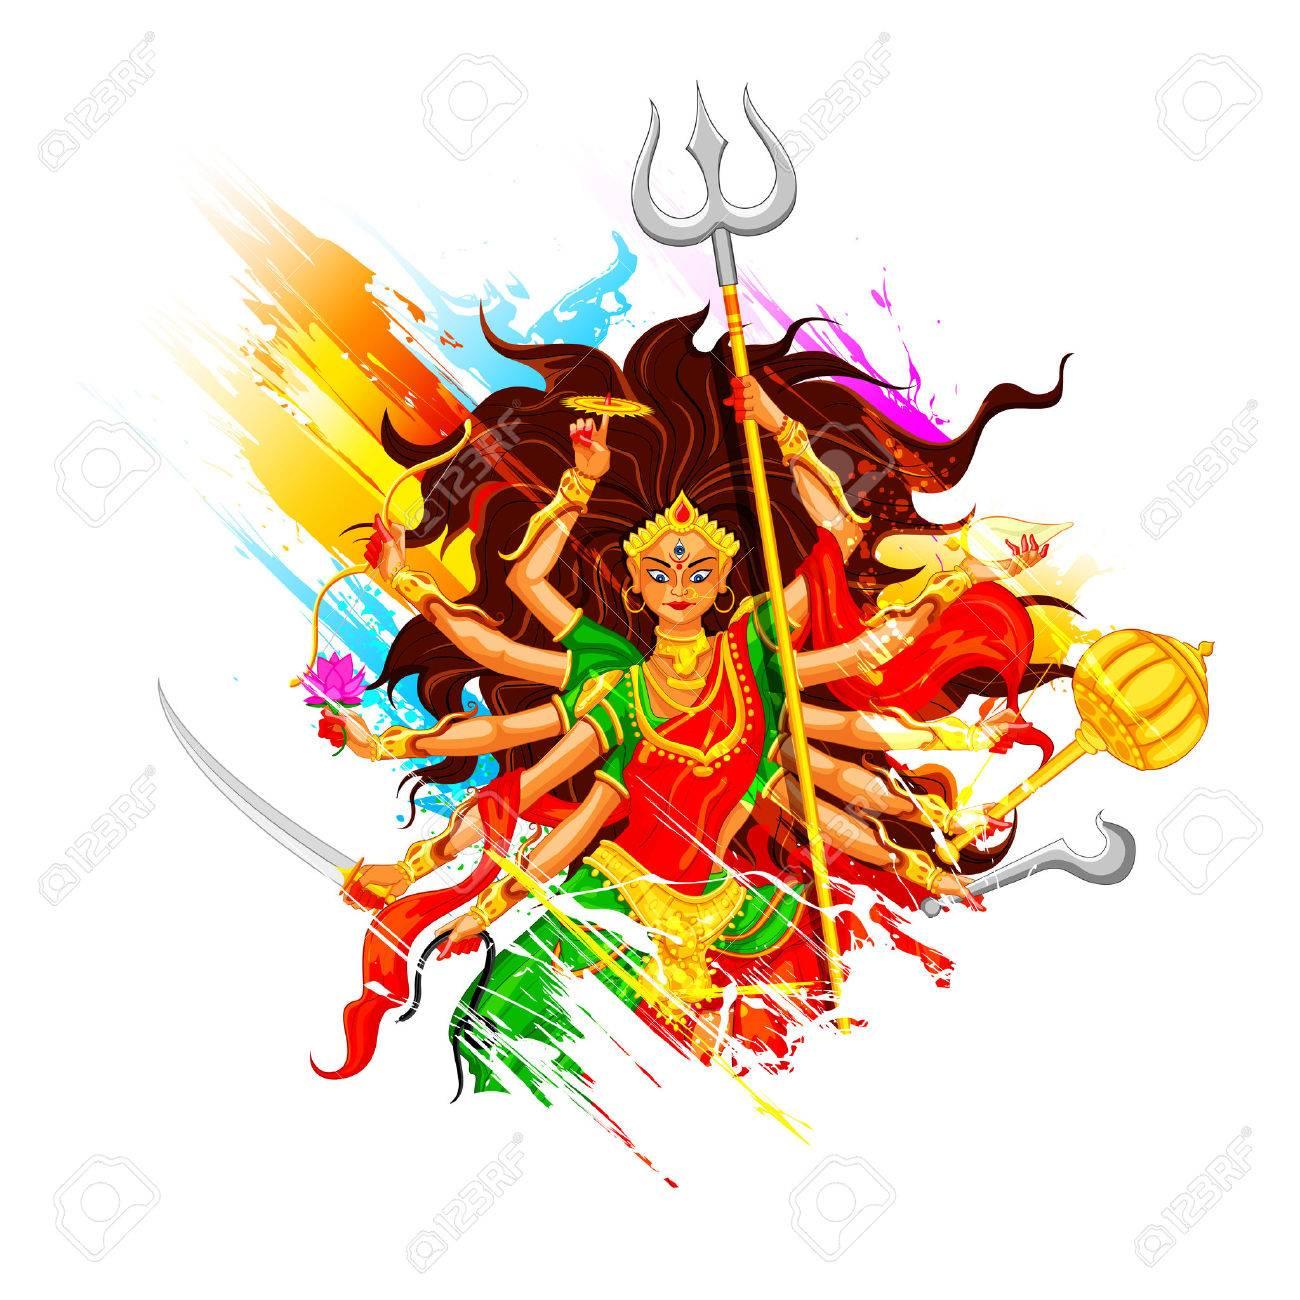 illustration of goddess Durga in Subho B-illustration of goddess Durga in Subho Bijoya (Happy Dussehra) background  Stock Vector - 25737204-10